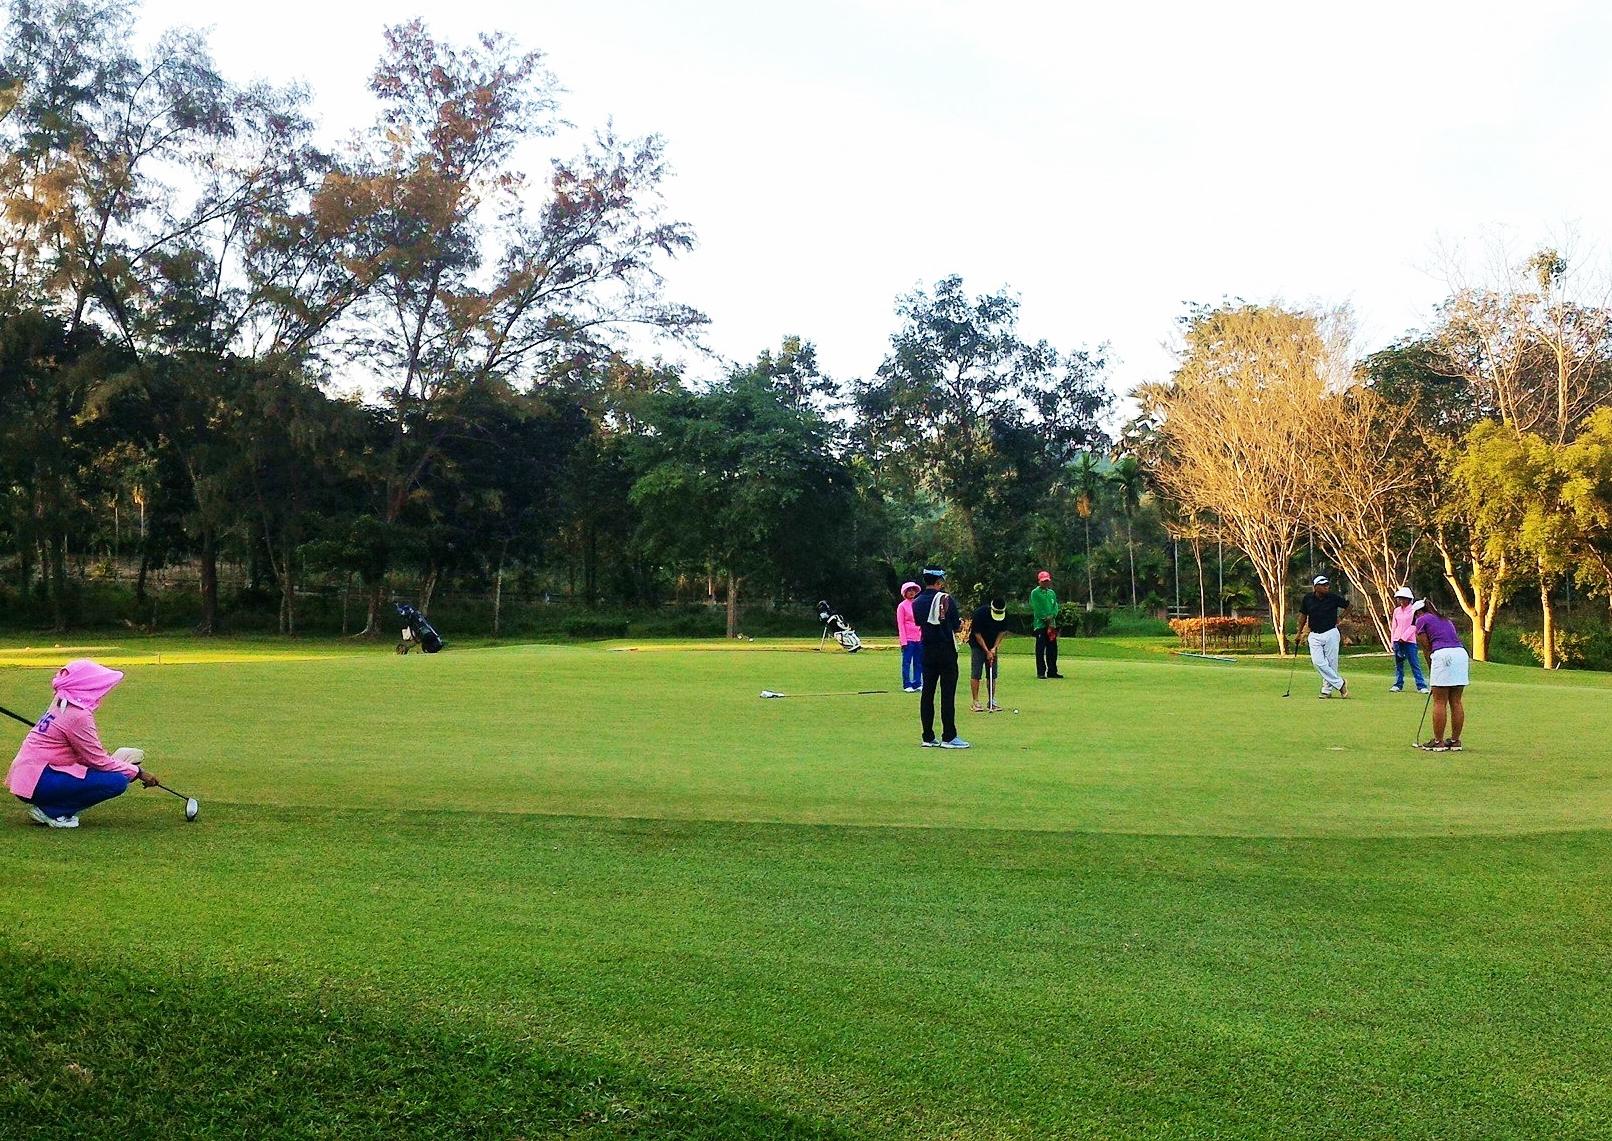 Plutaluang Navy Golf Club Pattaya